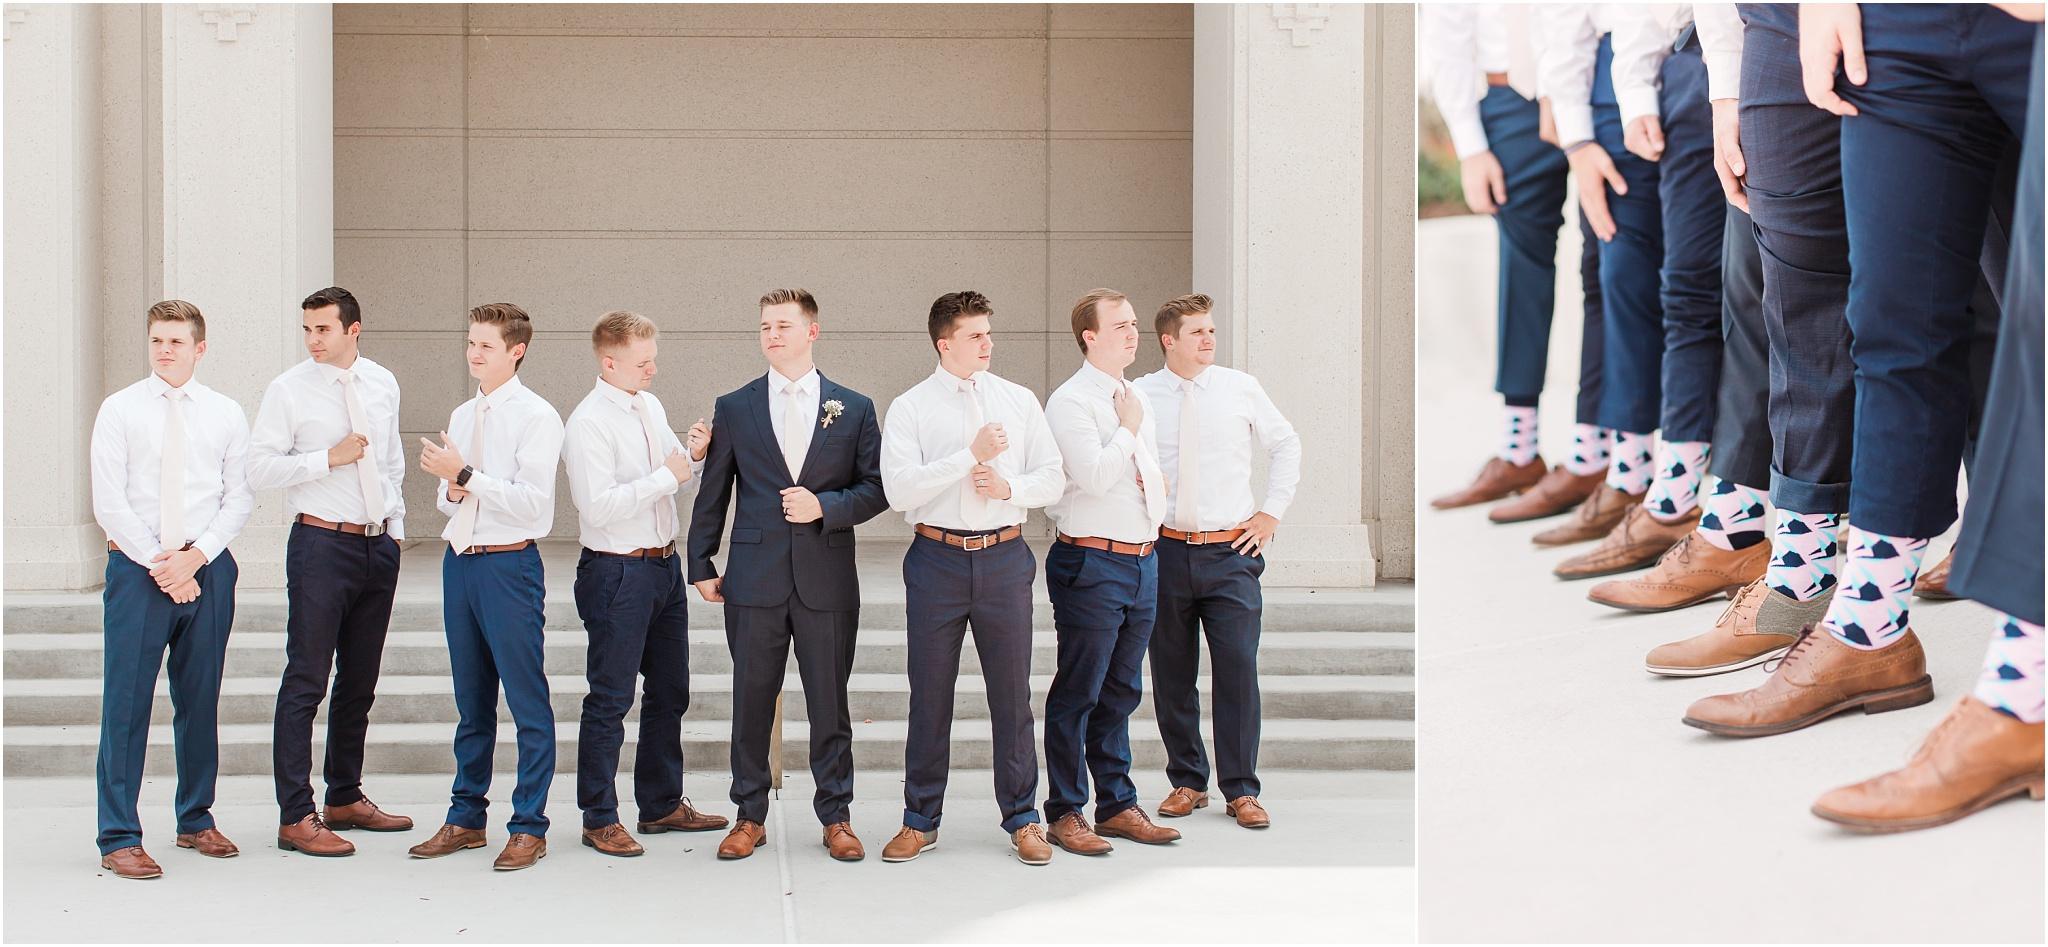 Wedding Photography_Meridian Idaho Temple_Boise Idaho_Nampa Idaho_Leah Southwick Photography_0043.jpg